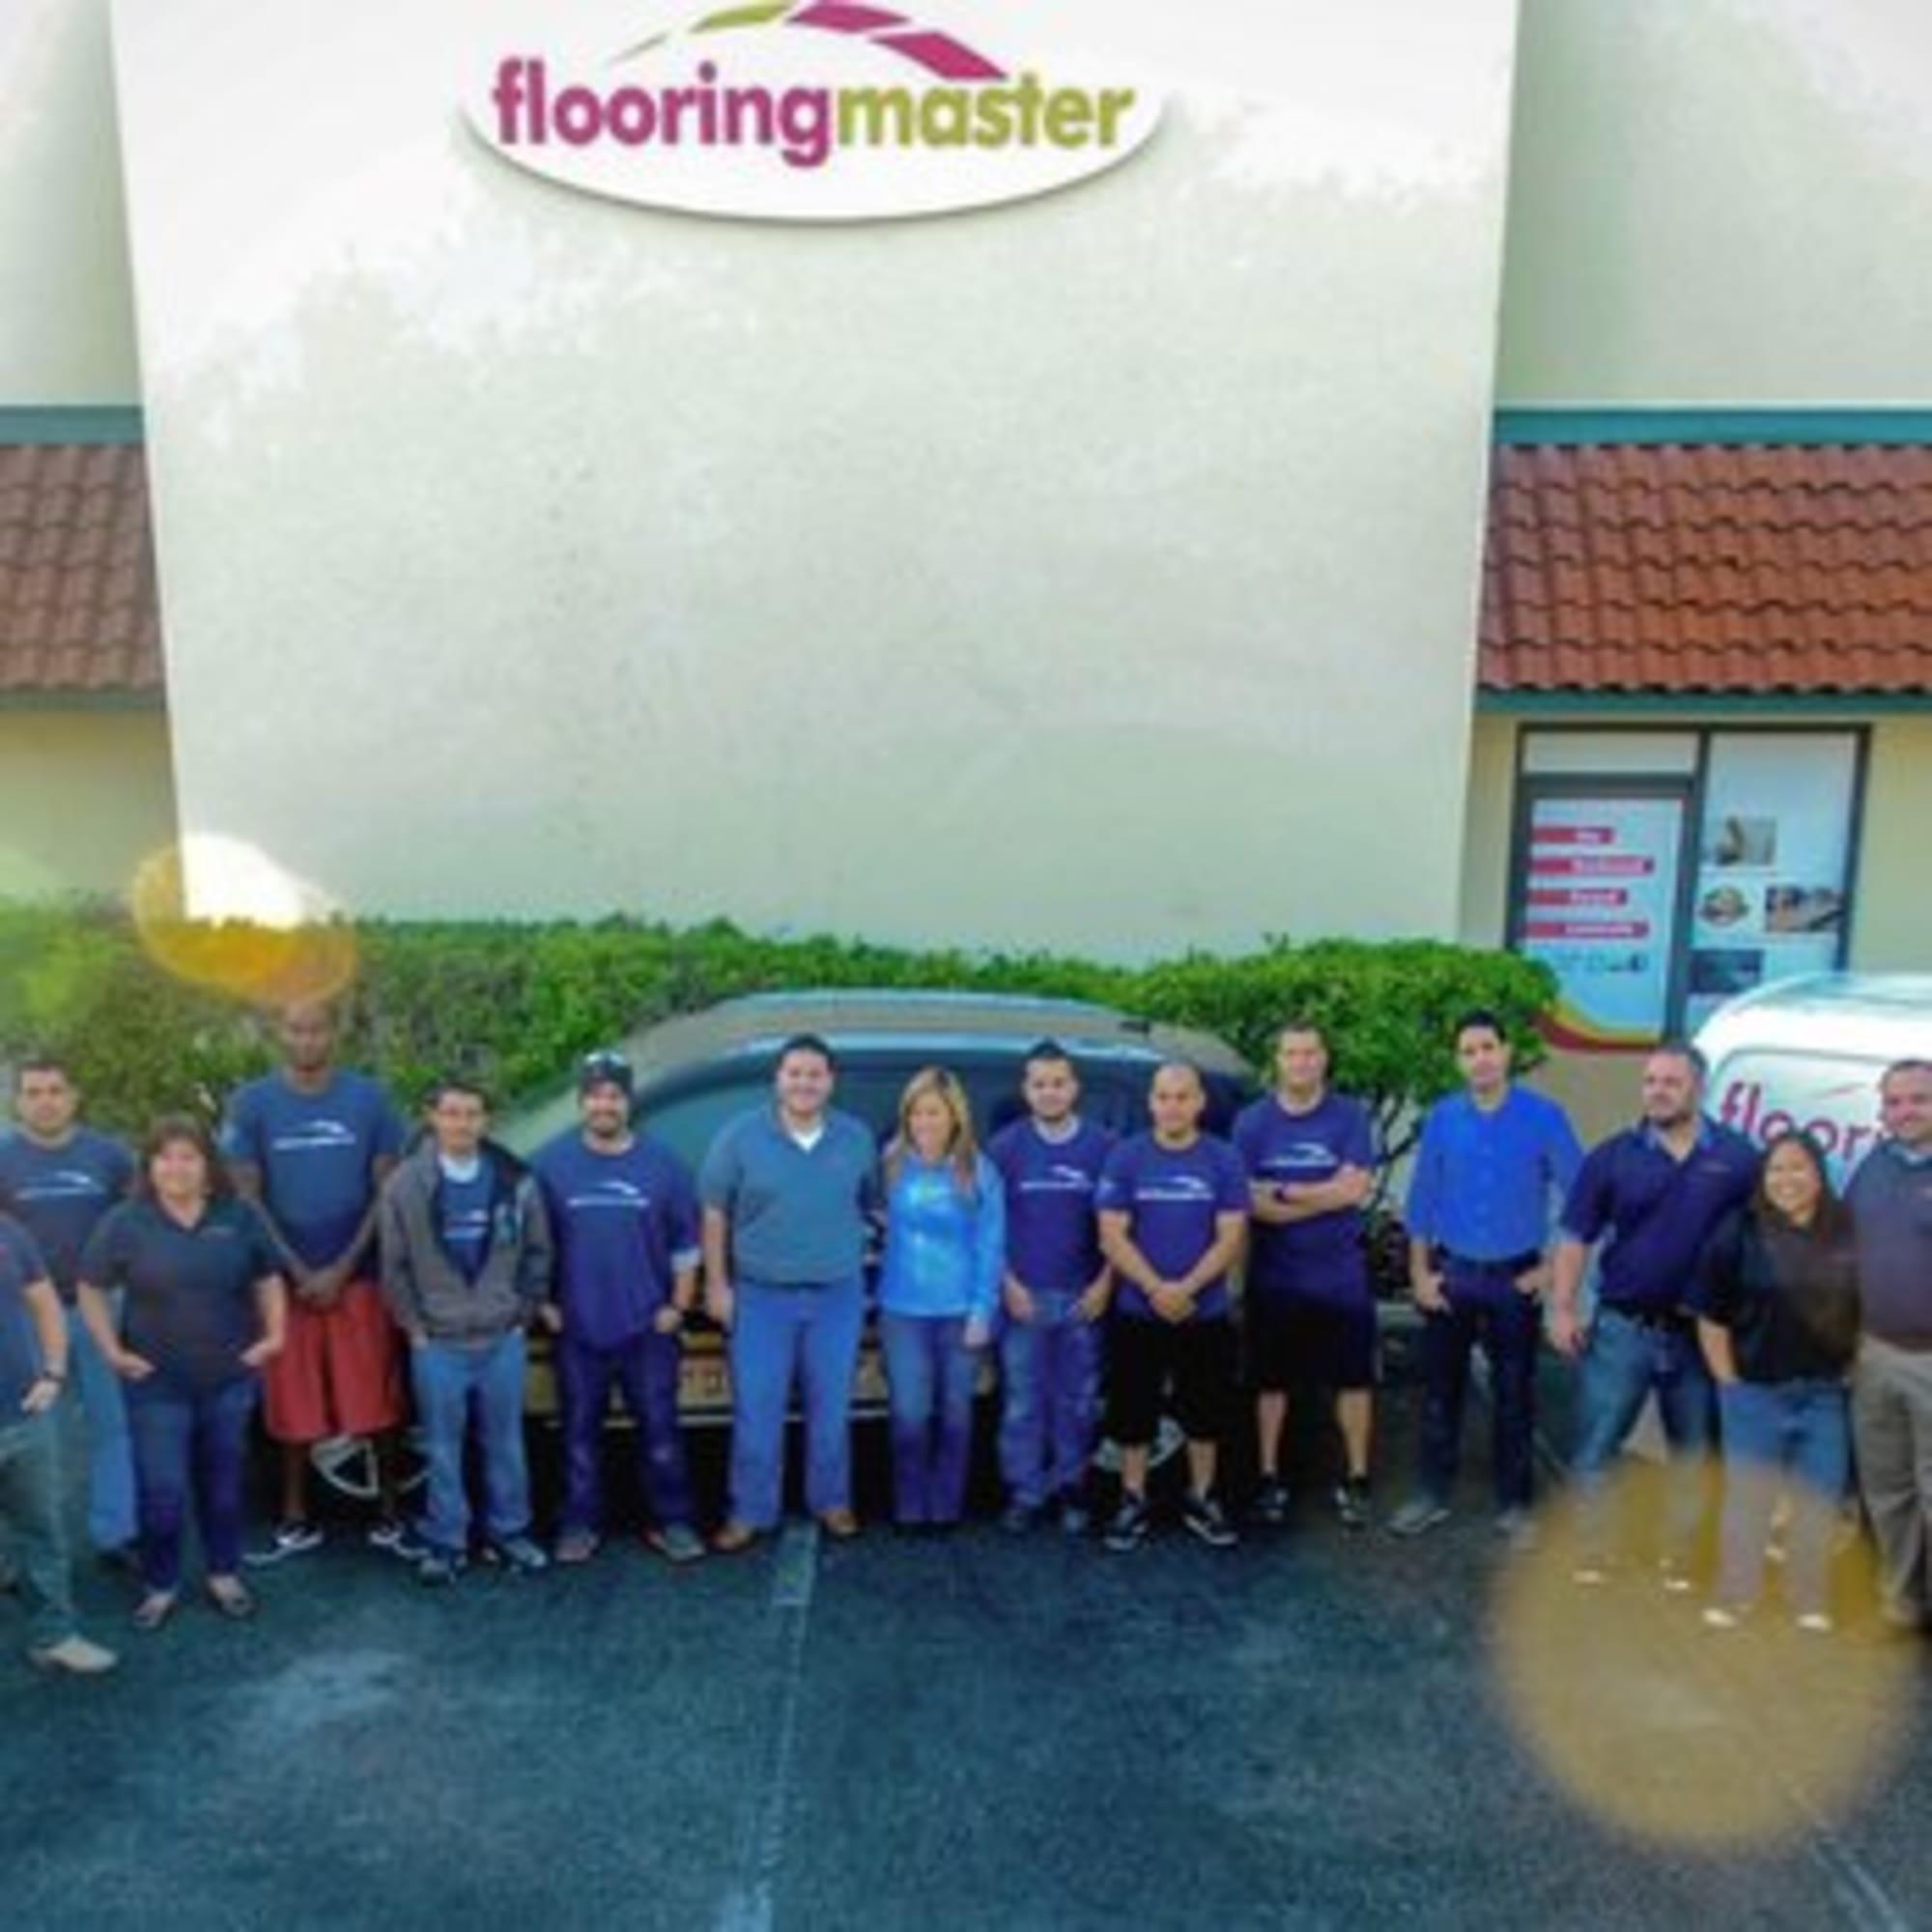 Flooring Master - 3450 Parkway Center Ct Orlando, FL 32808